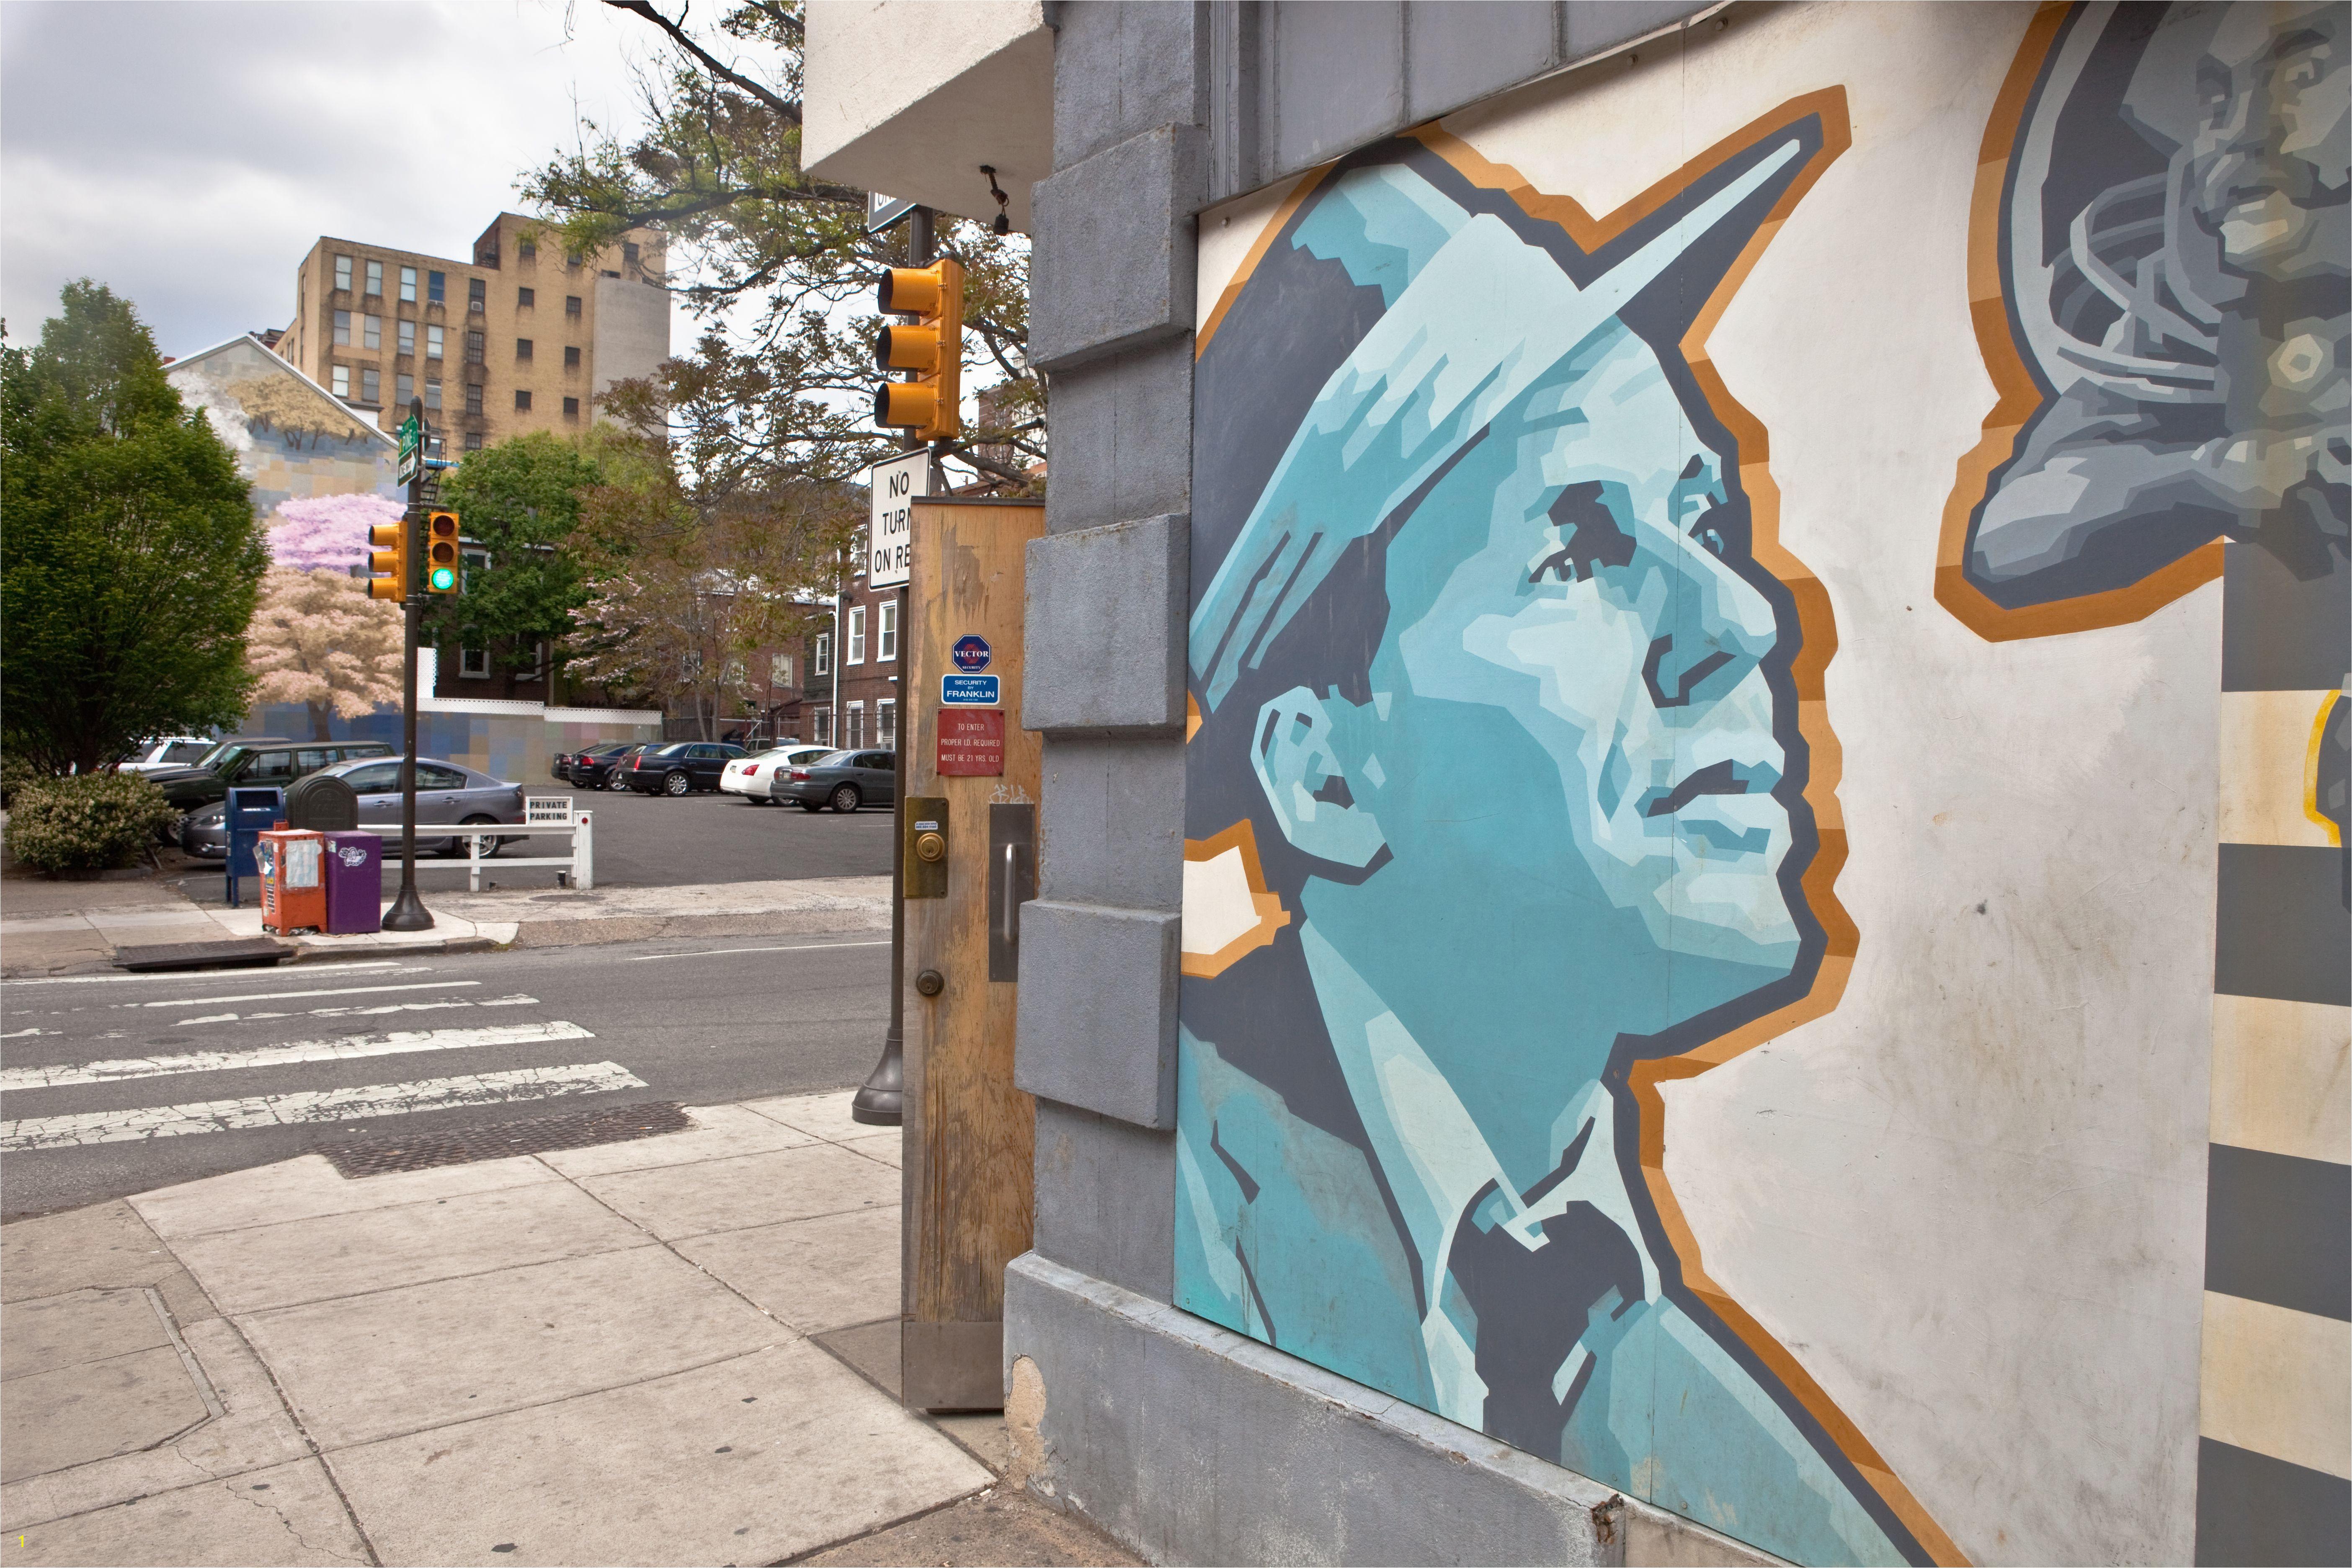 by Steve Weinik for the Mural Arts Program